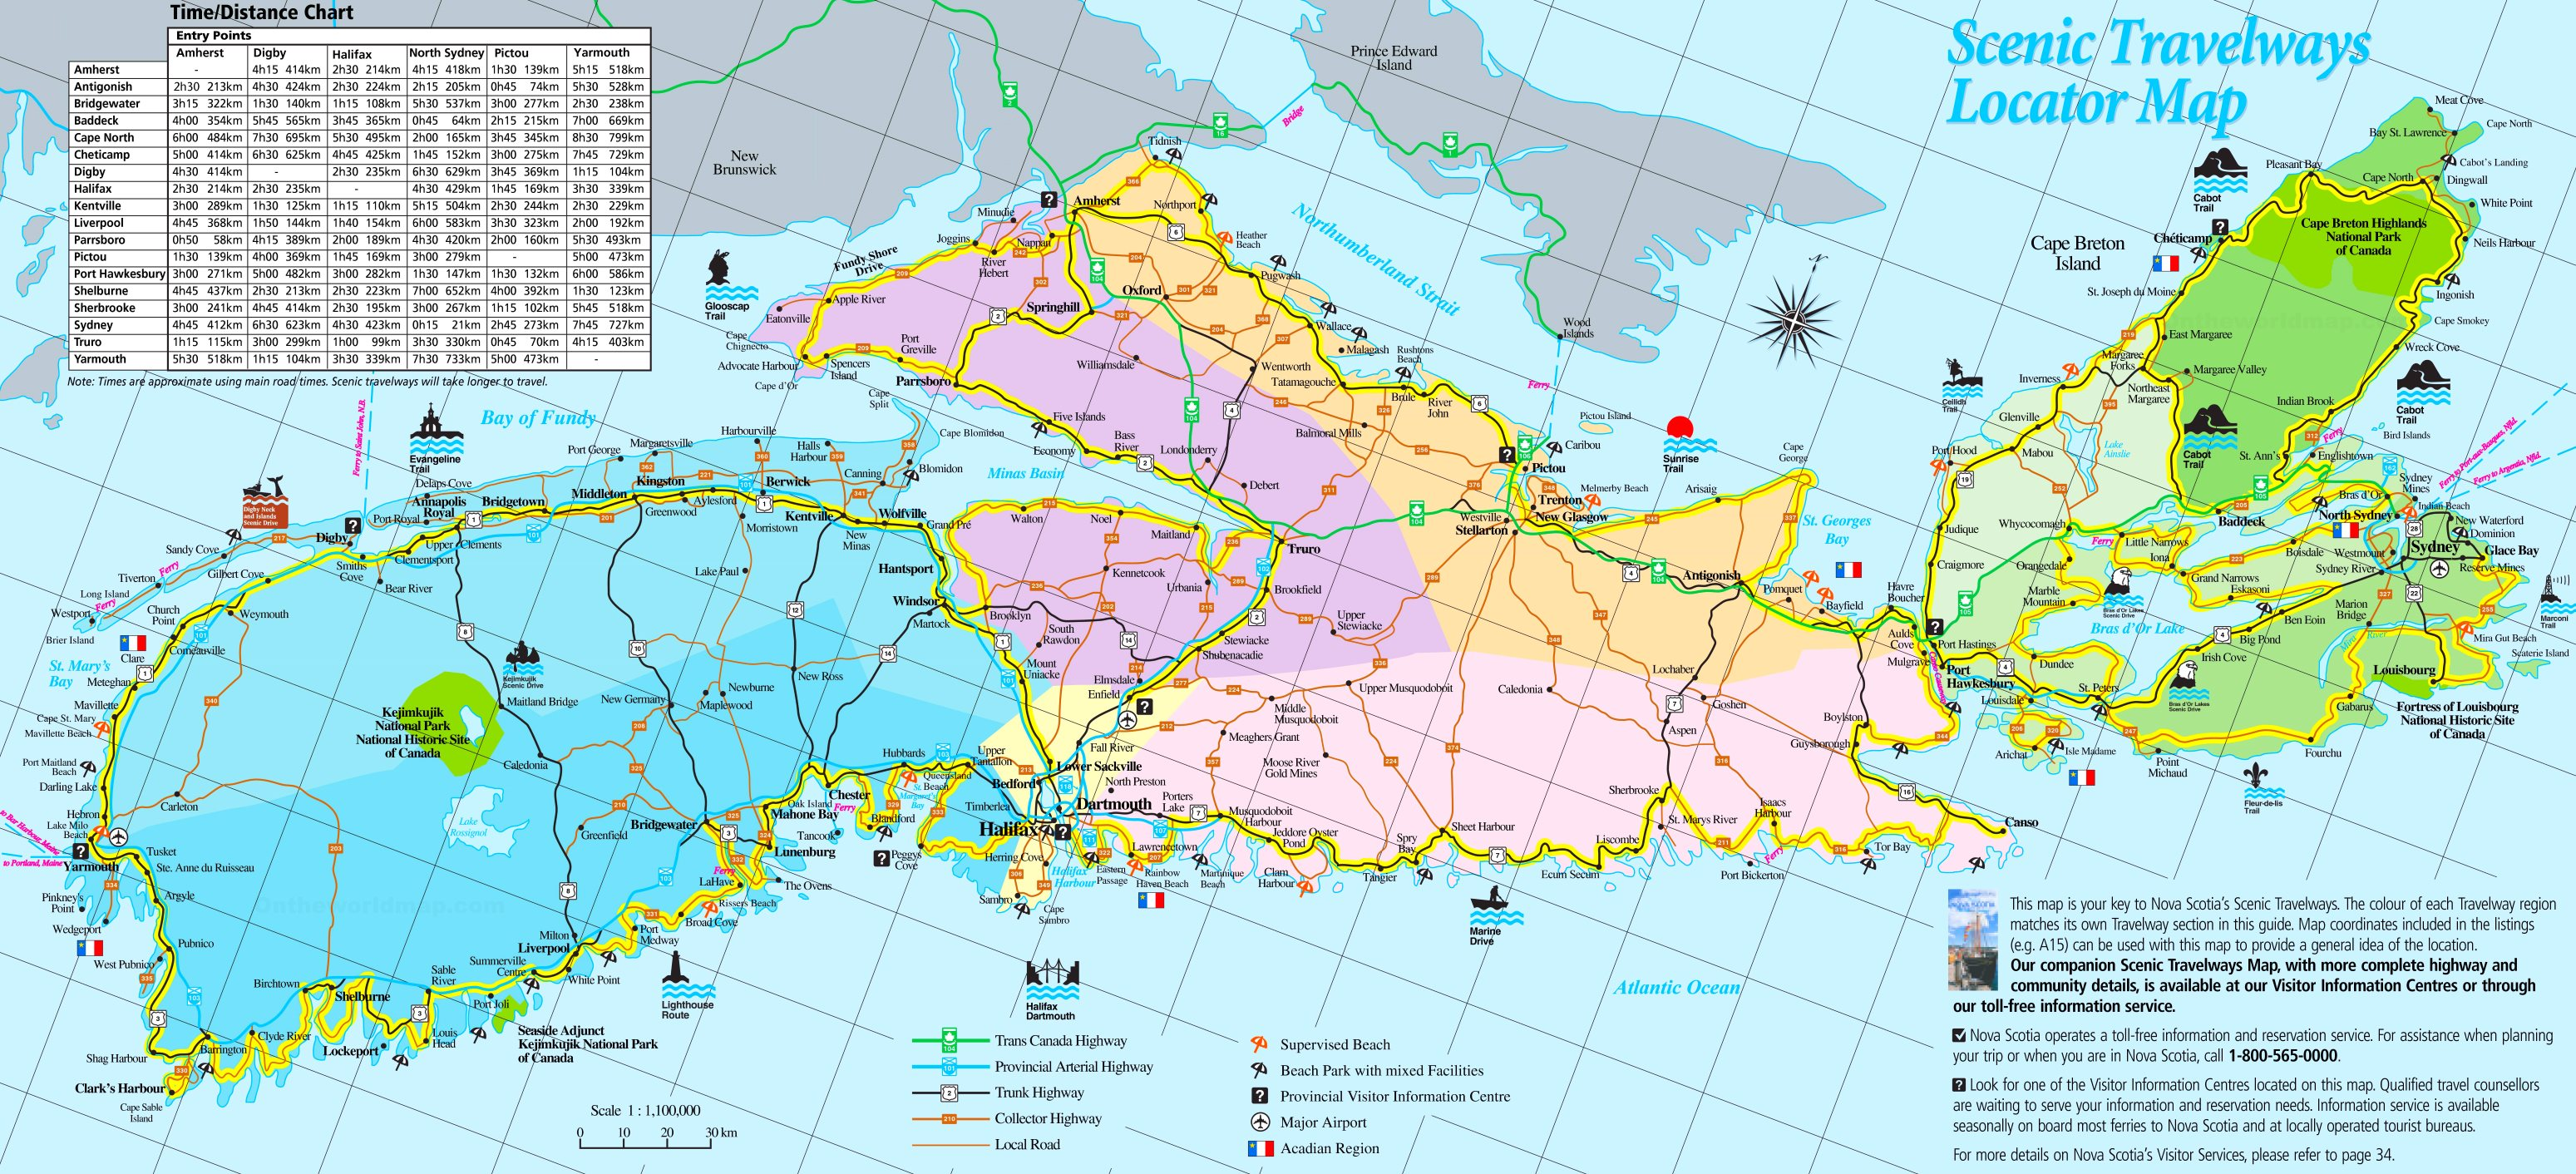 Nova Scotia Maps Large detailed tourist map of Nova Scotia